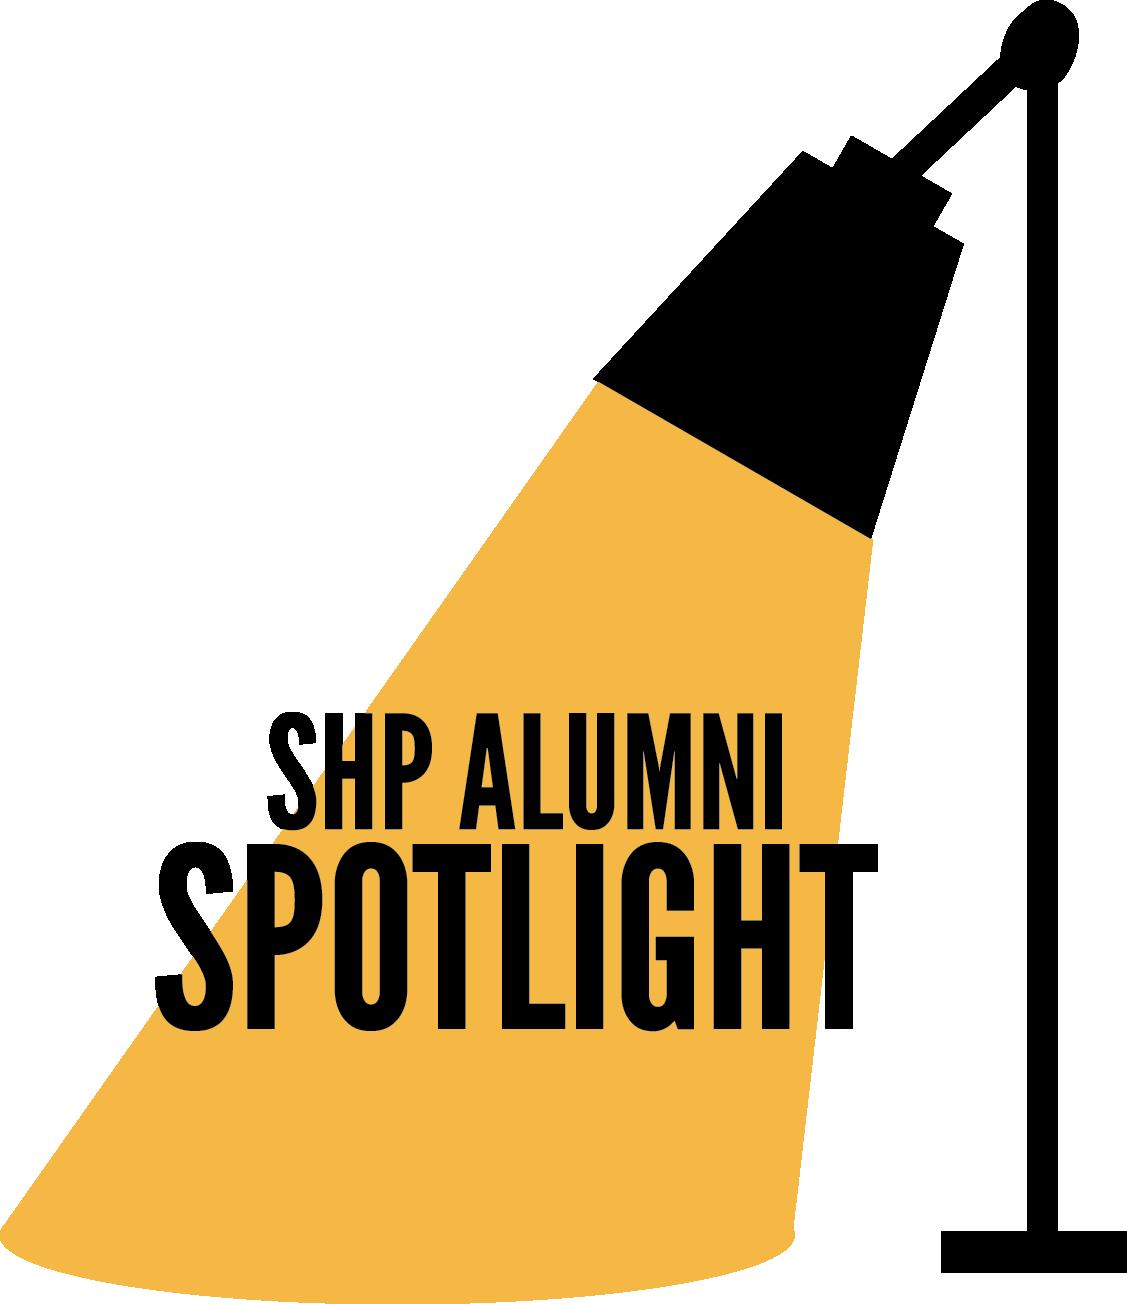 Graduate clipart alumnus. Shp alumni spotlight why